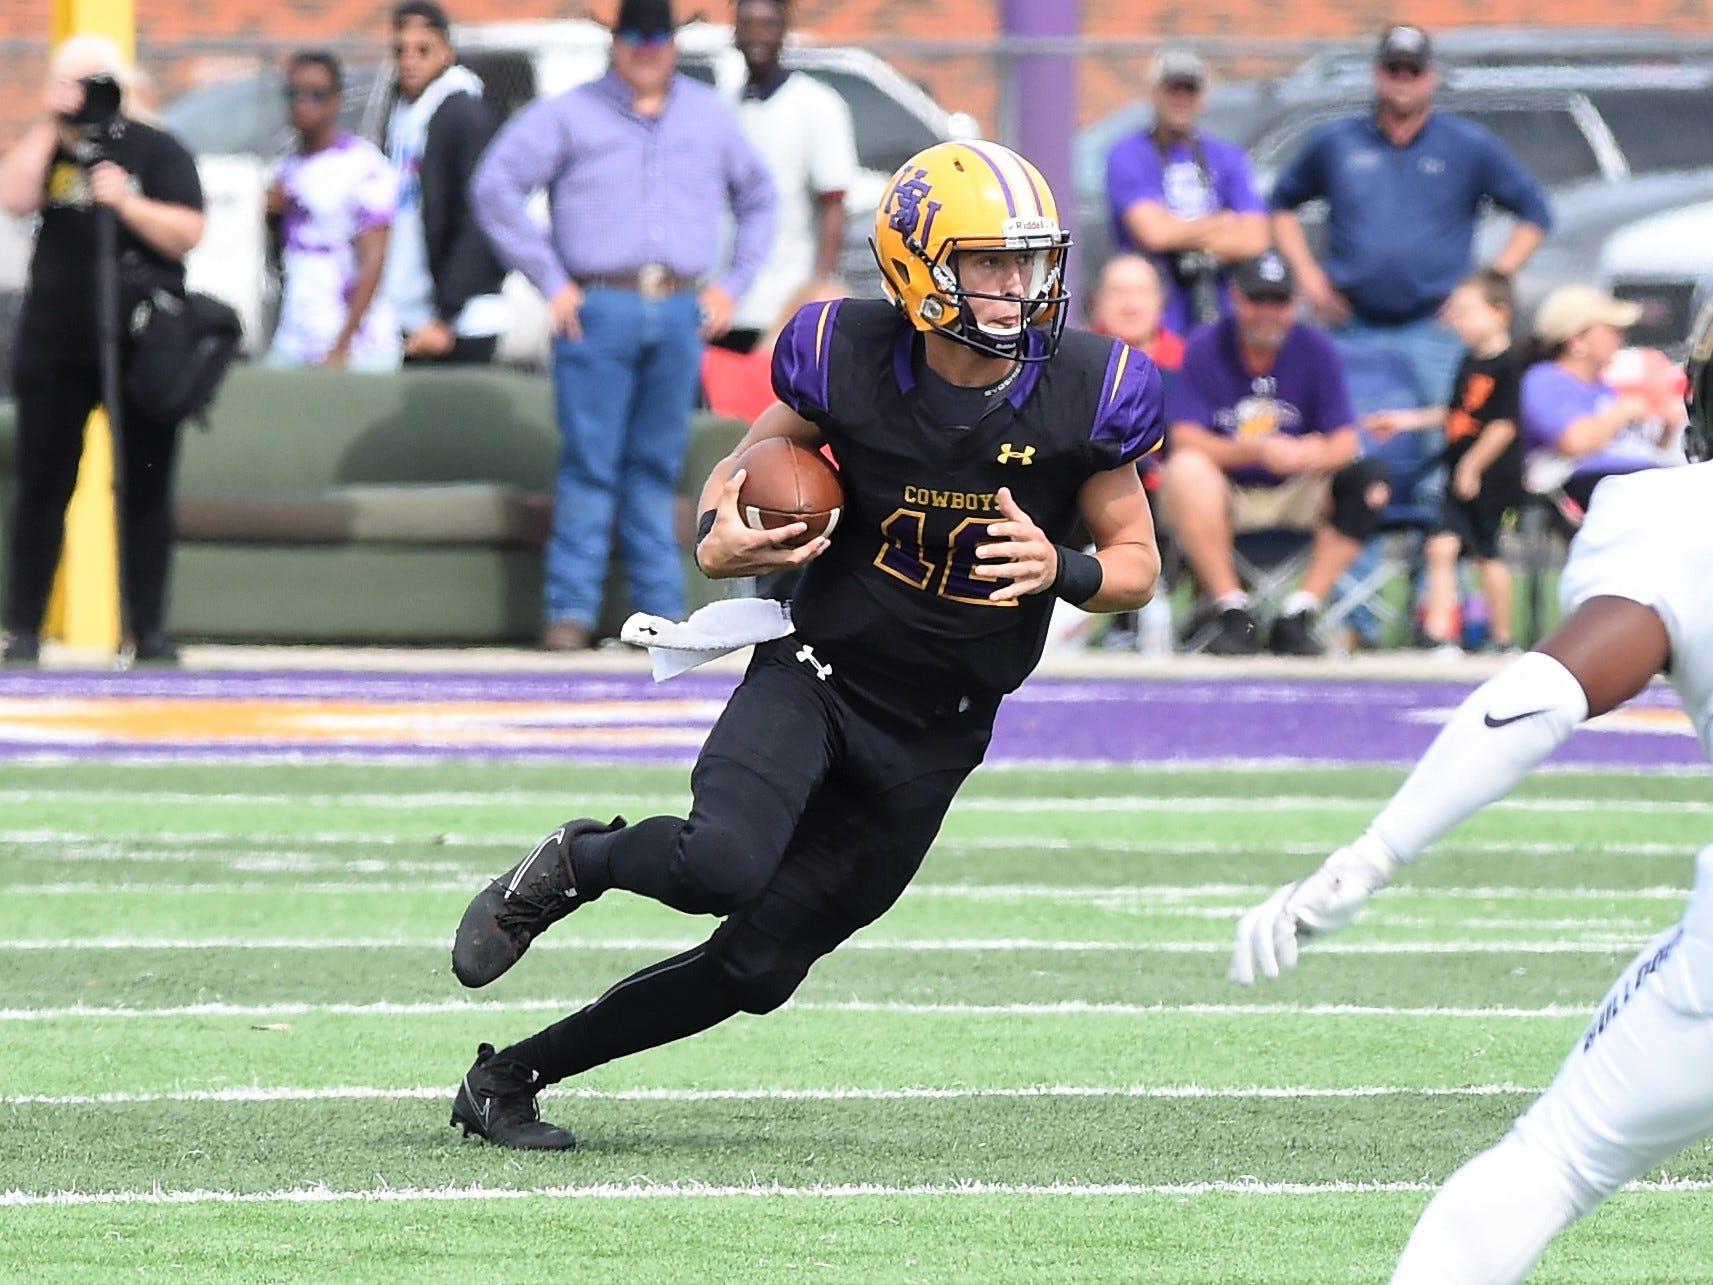 Hardin-Simmons quarterback Ty Hooper (12) scrambles for yards against Texas Lutheran at Shelton Stadium on Saturday, Oct. 20, 2018.